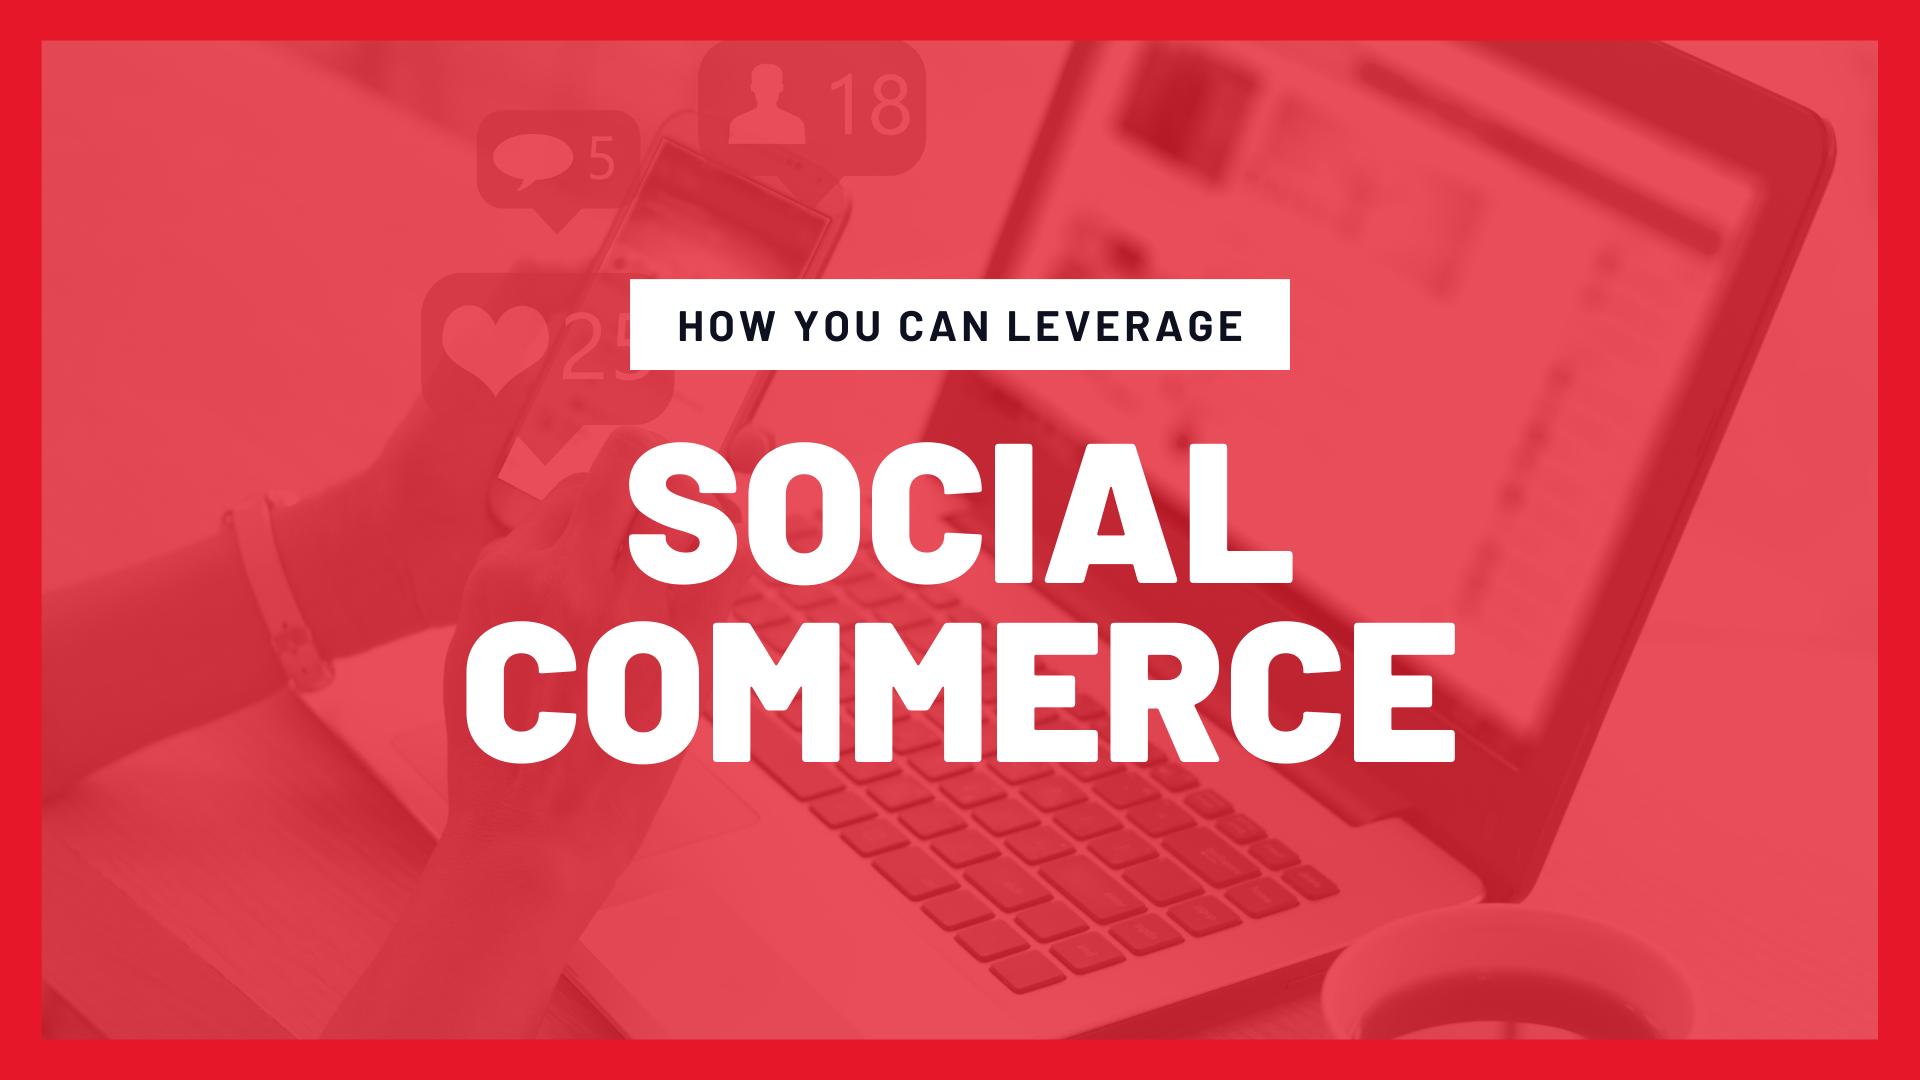 leverage social commerce, social commerce, social commerce 2021, social commerce strategies, how to social commerce, social commerce ecommerce, online business strategies